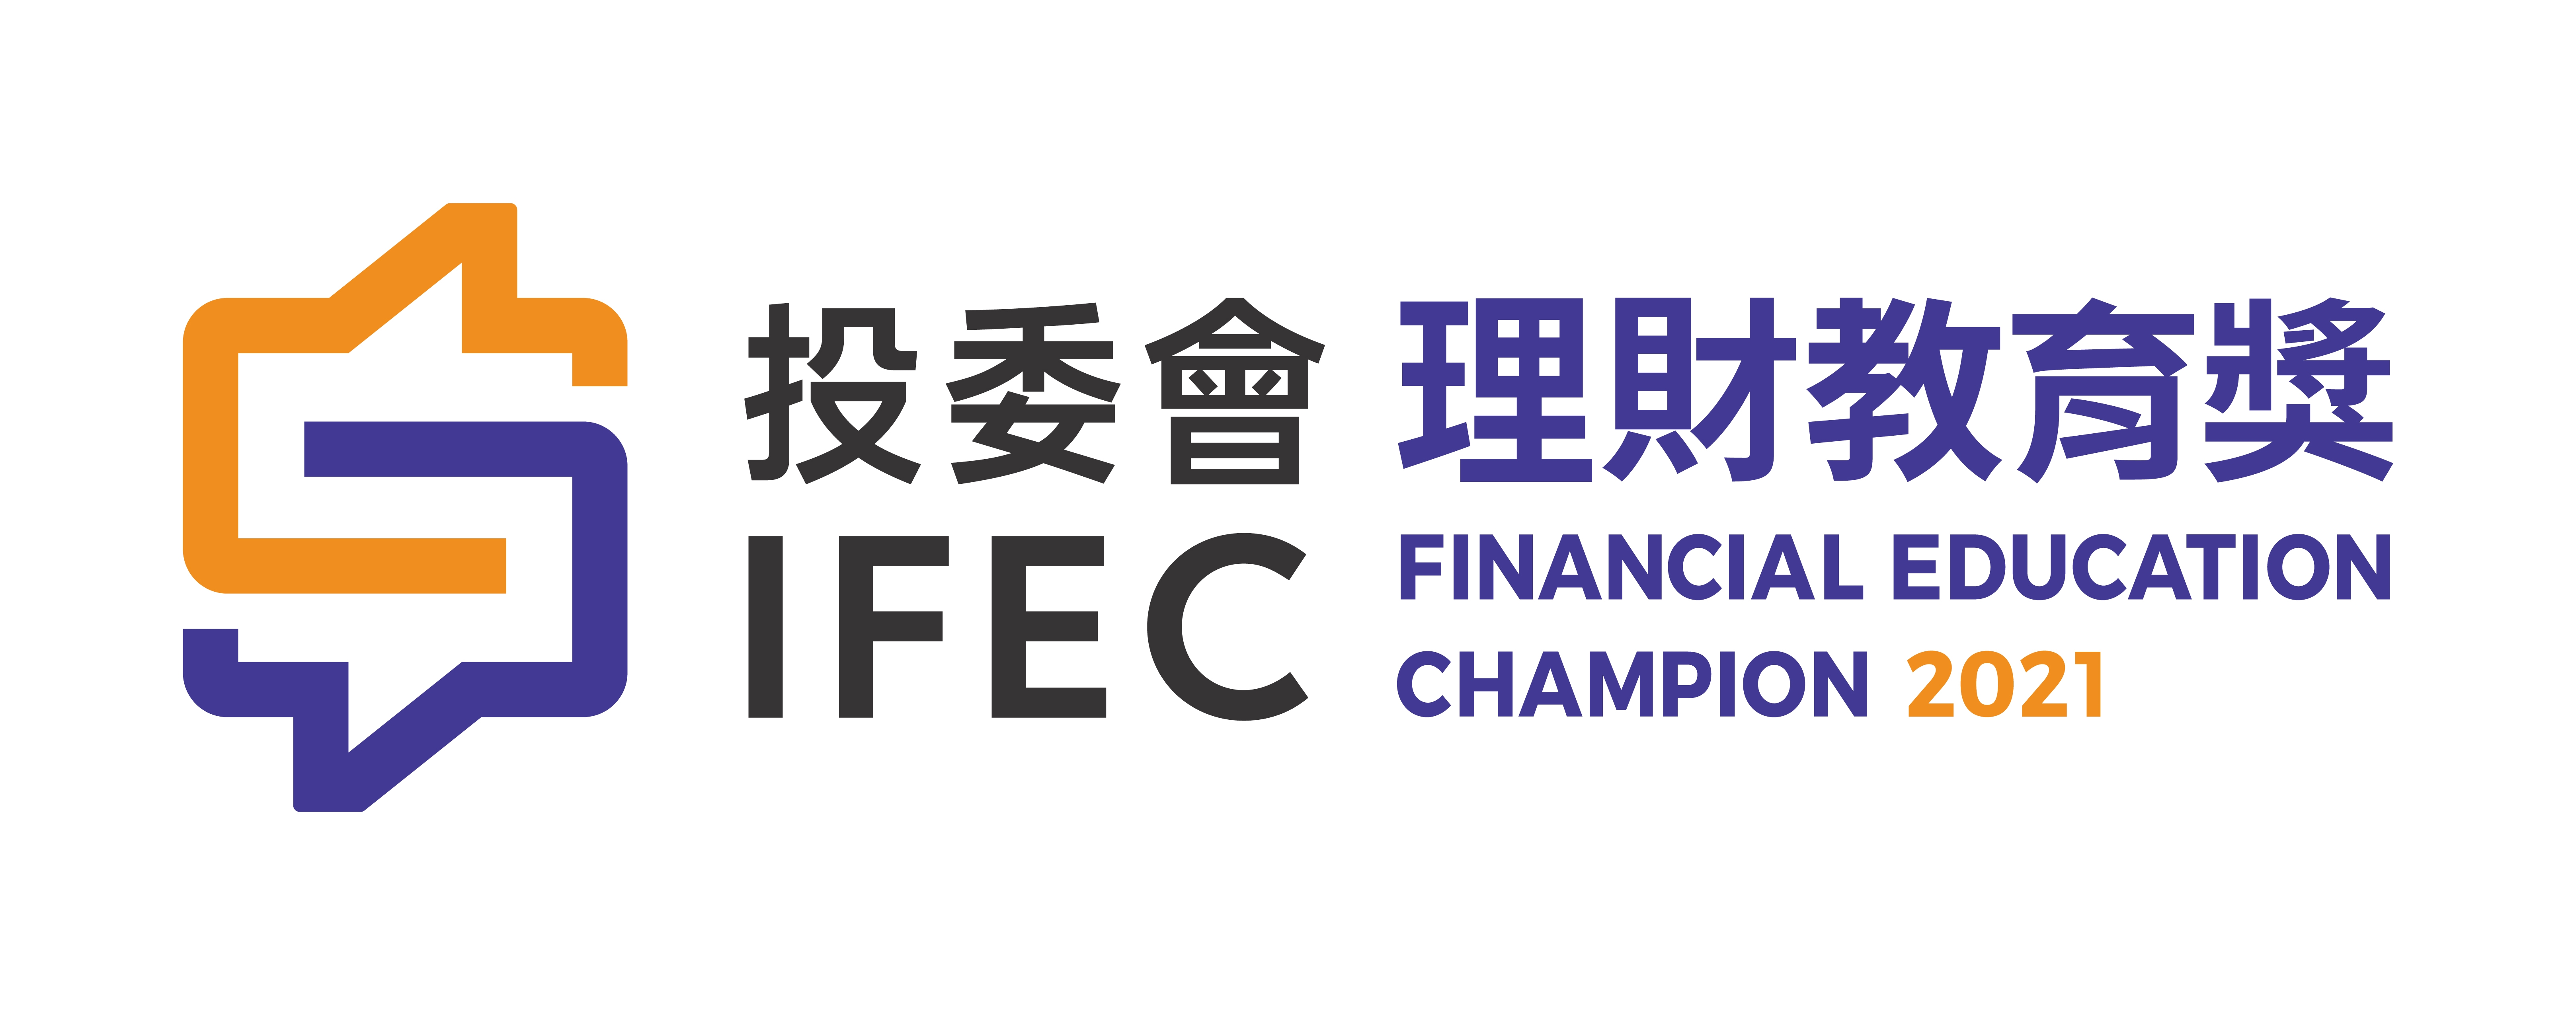 IFEC_FEC2021_Color_Pantone-01.jpg